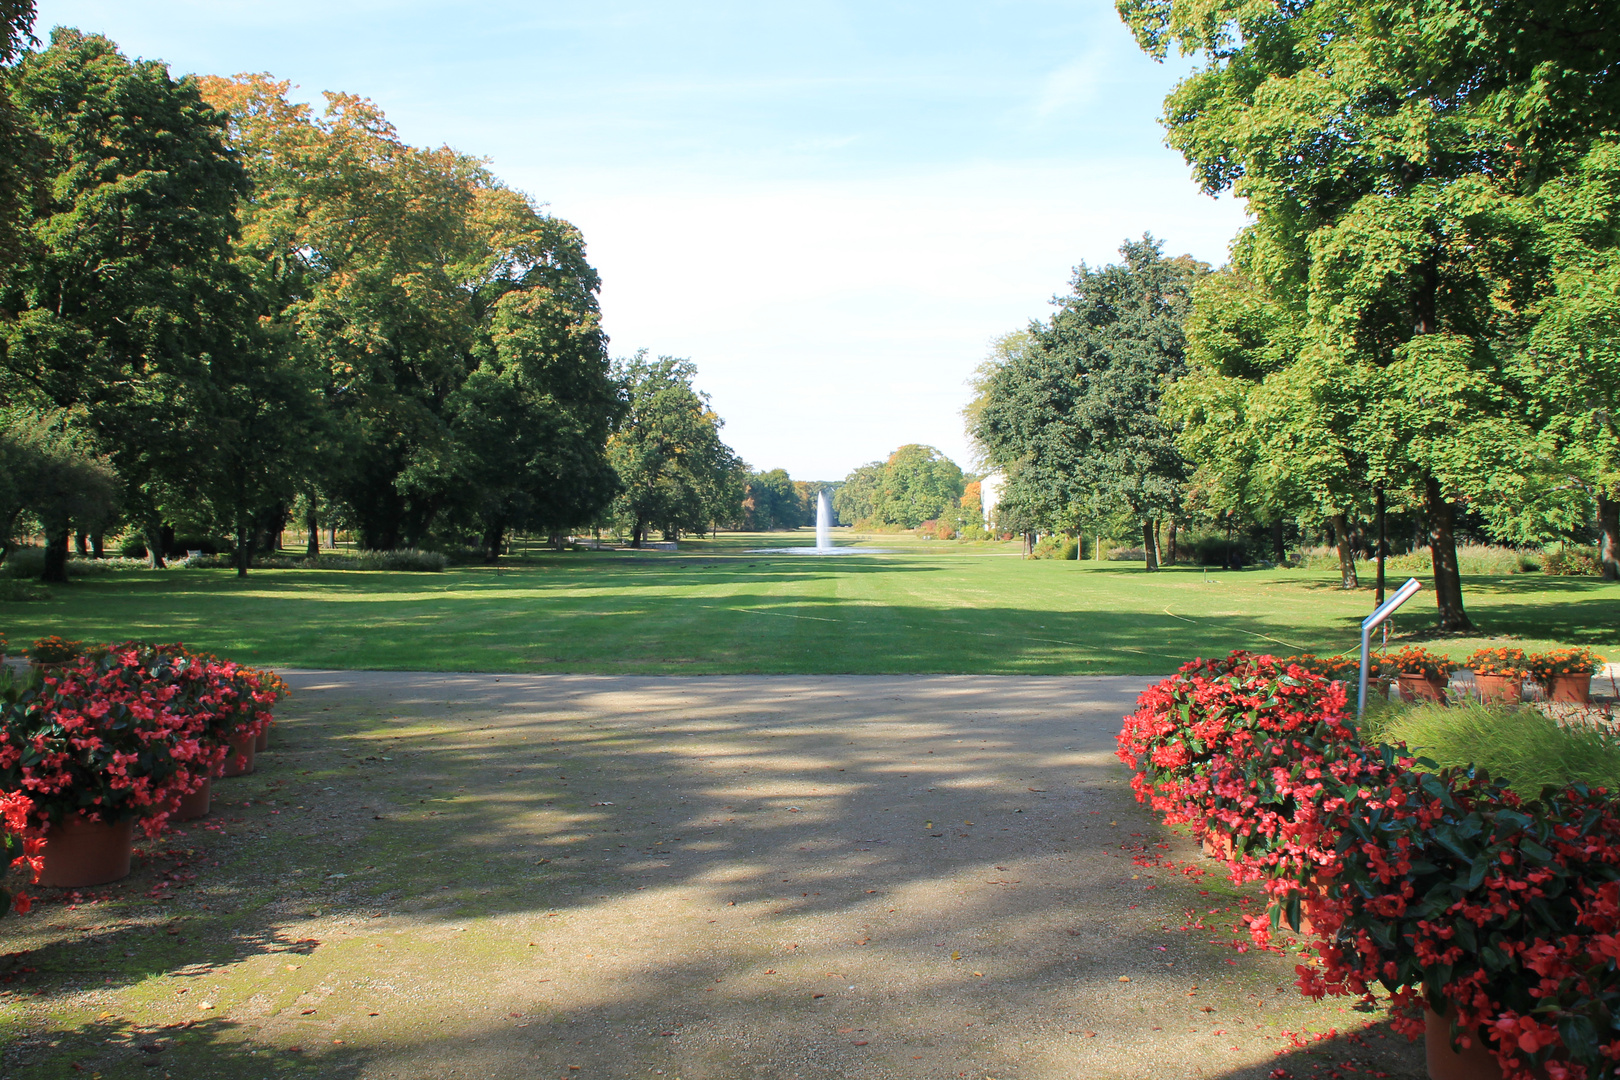 Eingang zum Park